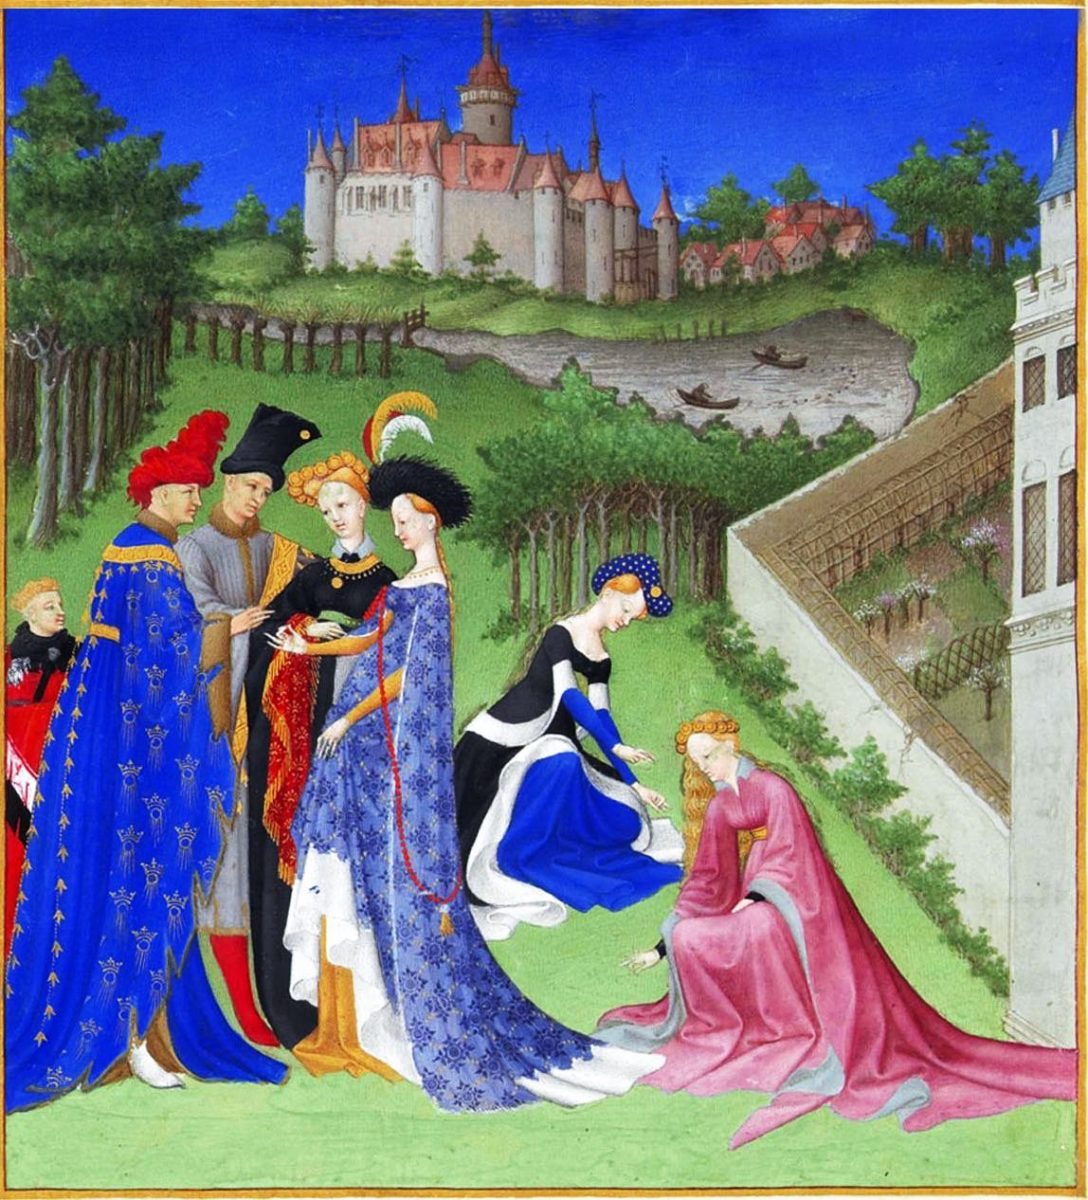 Stundenbuch, Herzog, Houppelande, Tappert, Gewandung, Mittelalter, Gotik, Kostüme,